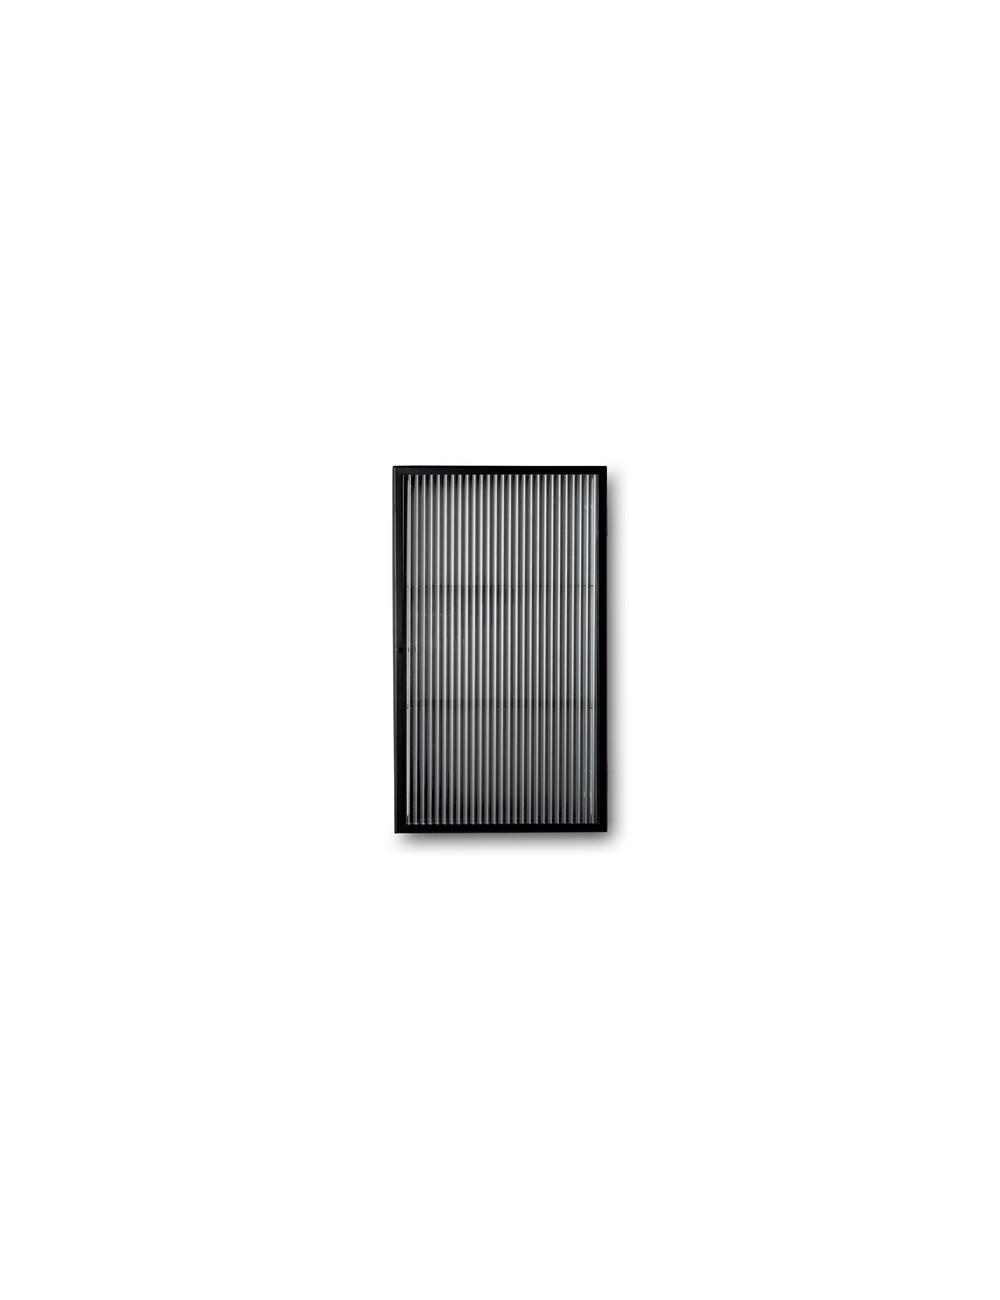 Haze Wandkastje | reeded glass zwart